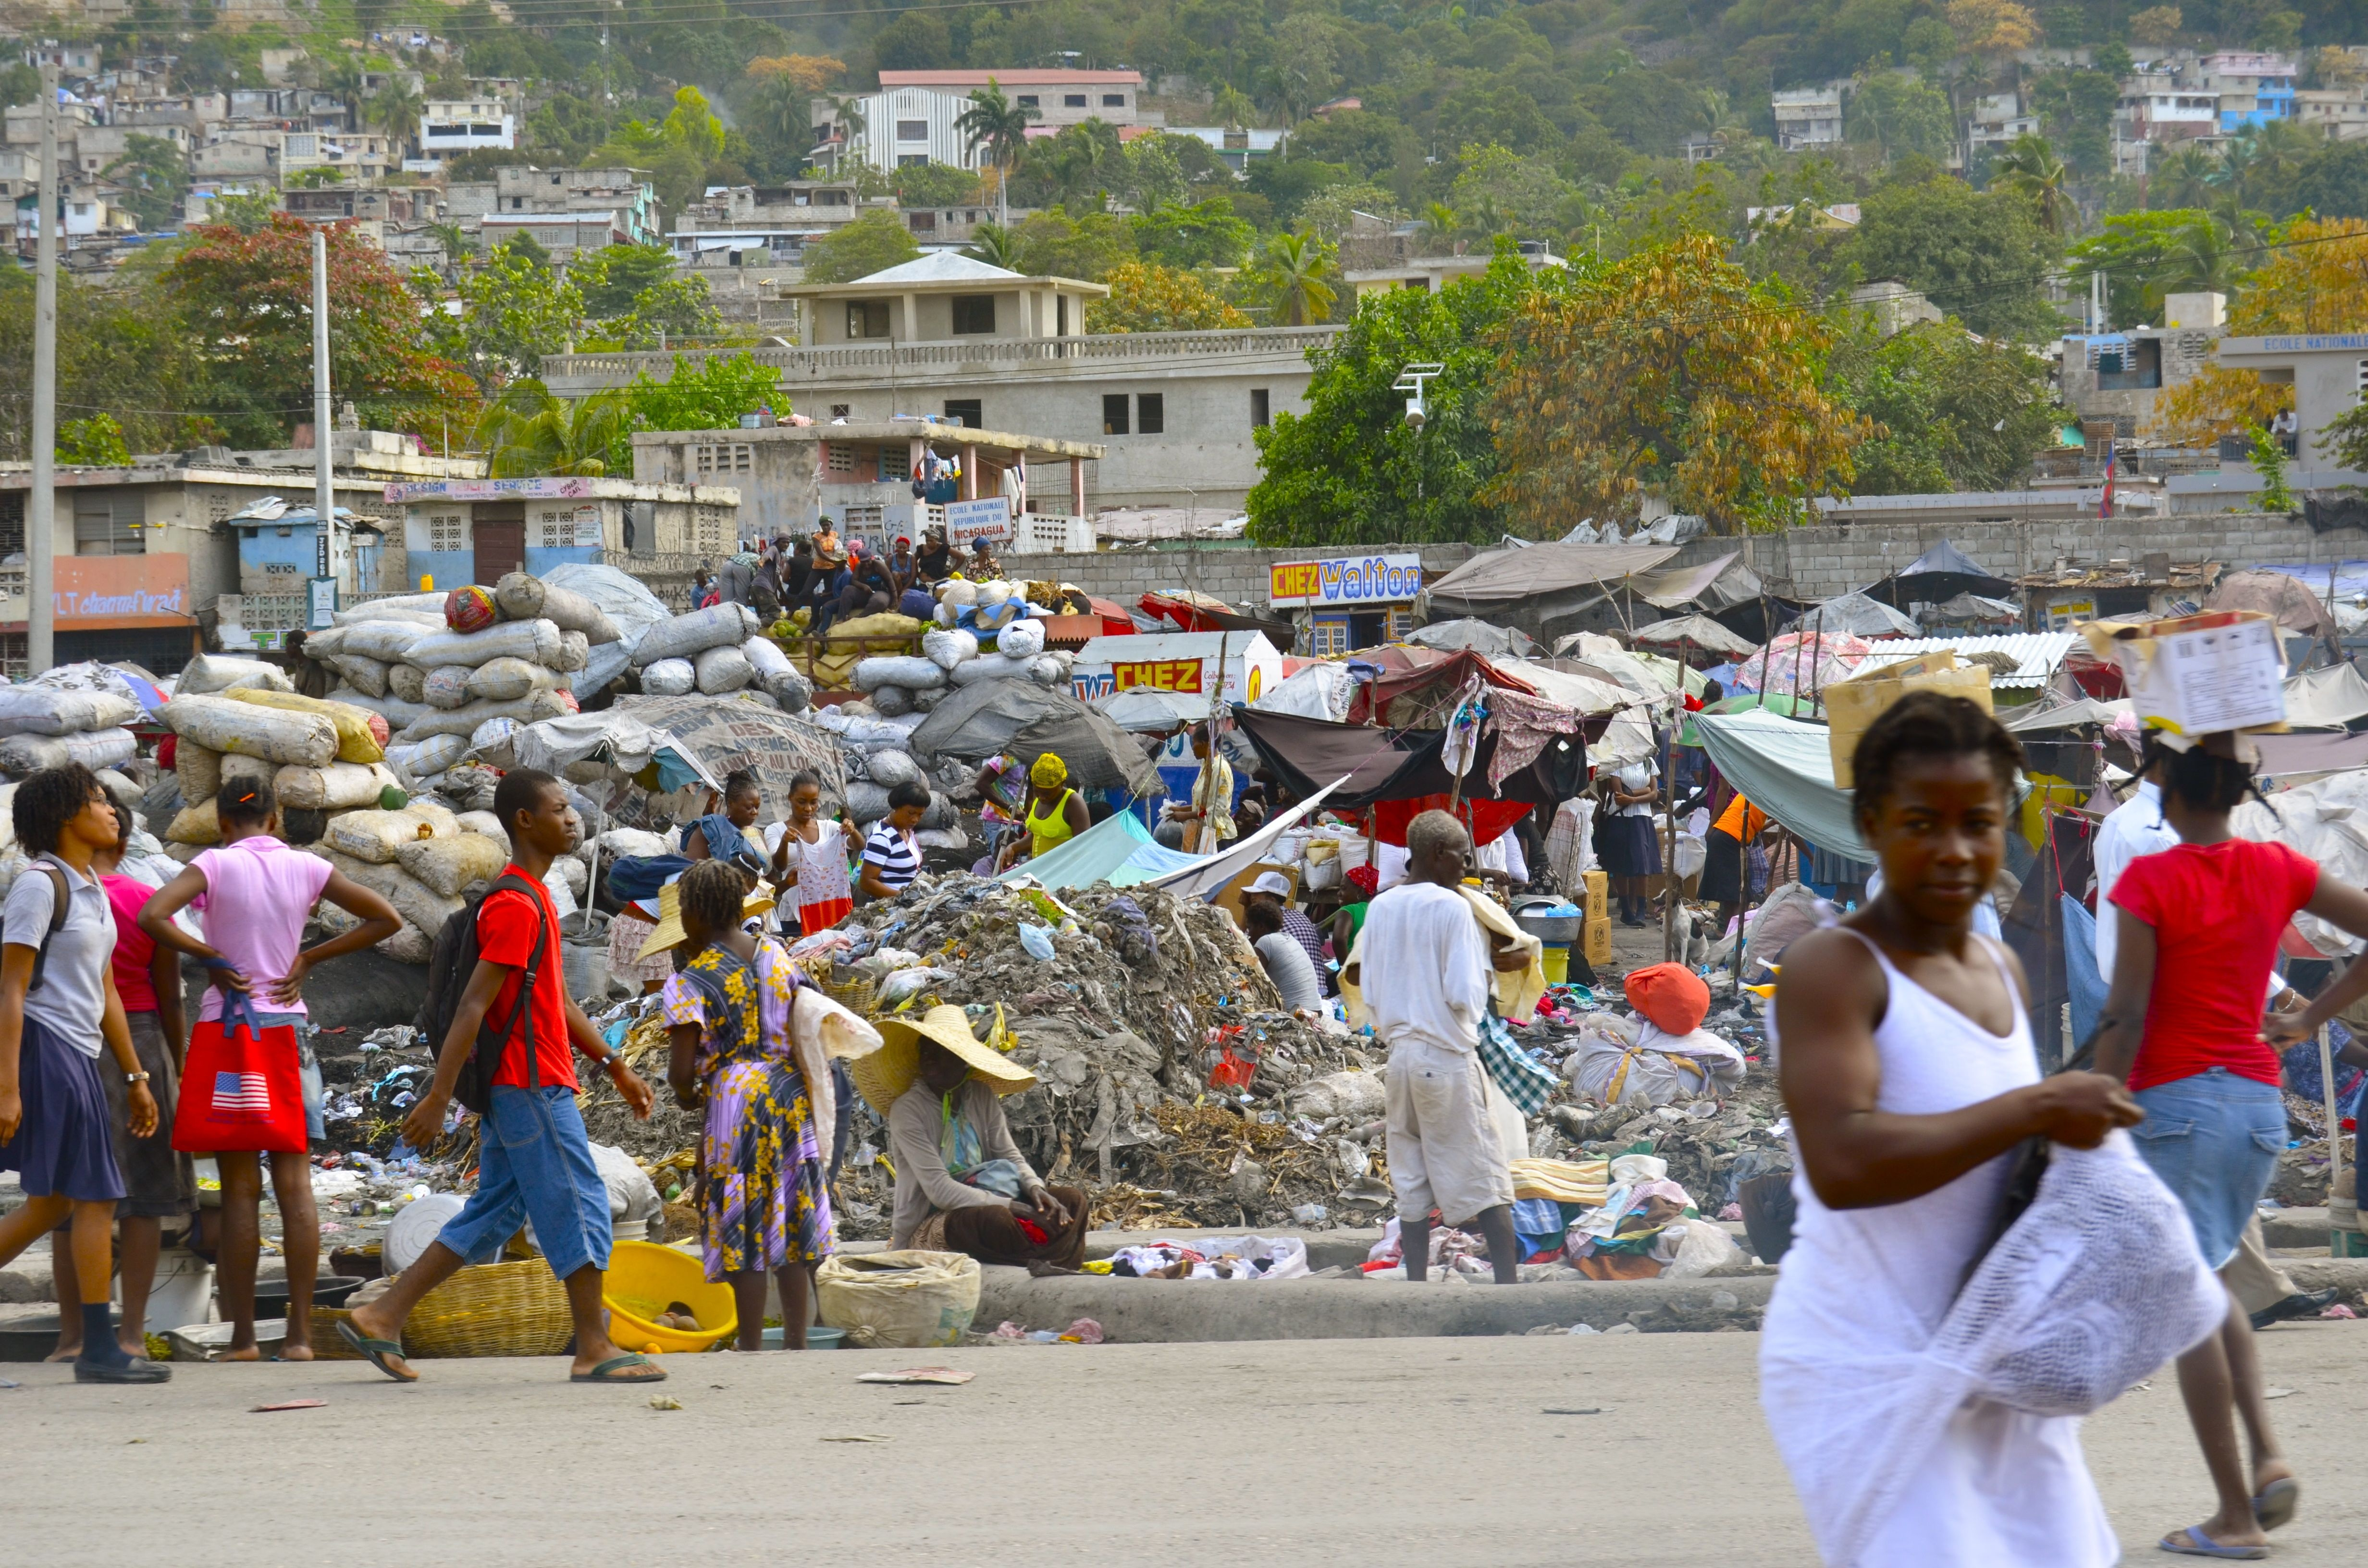 Mexico: Migrant crisis following massive influx of Haitian migrants